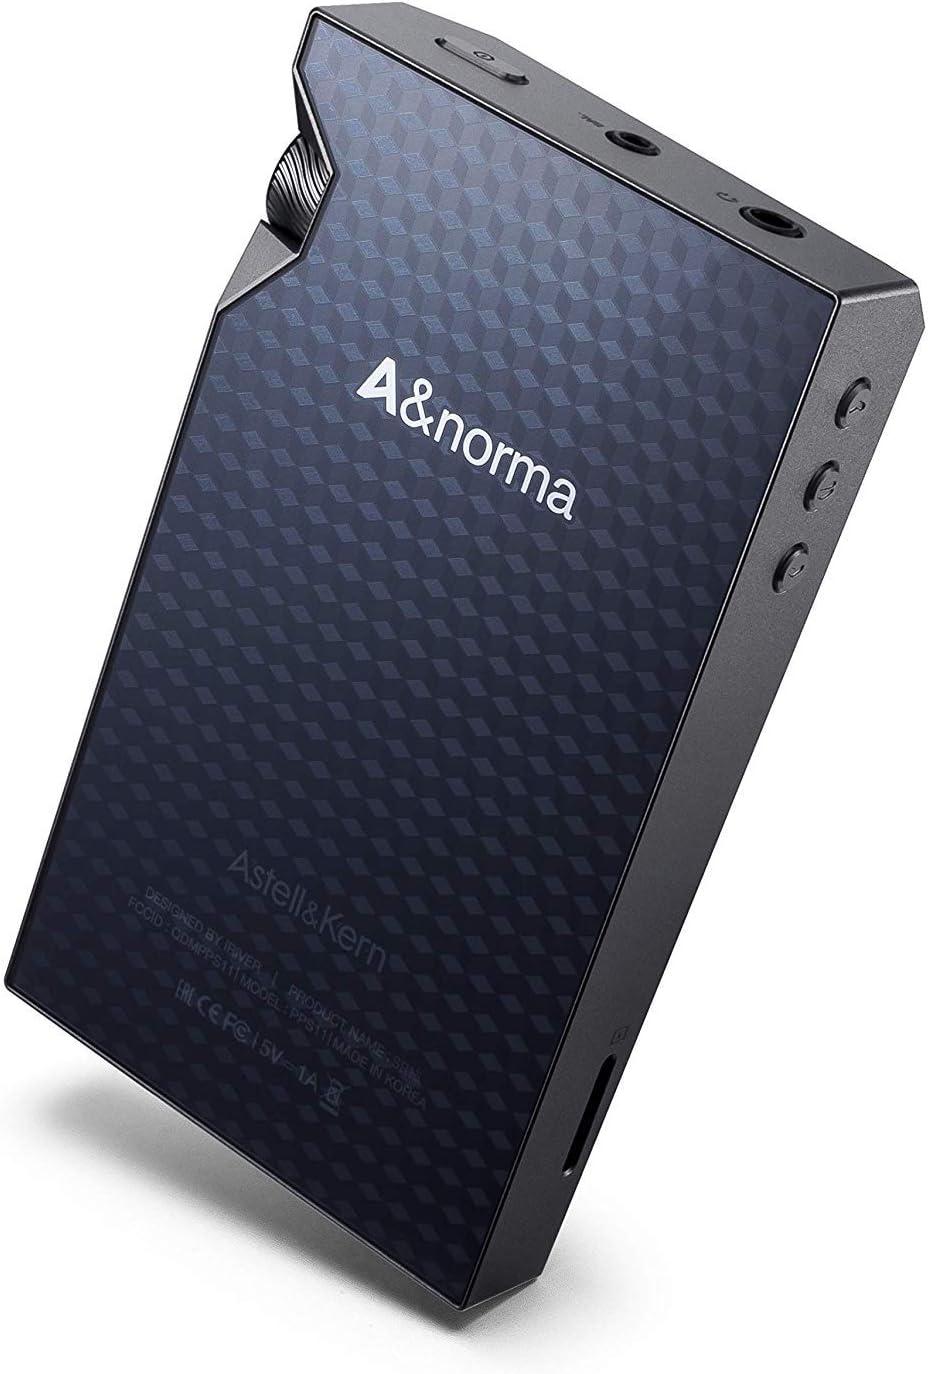 Astell Kern A Norma Sr15 High End Player Mit Elektronik